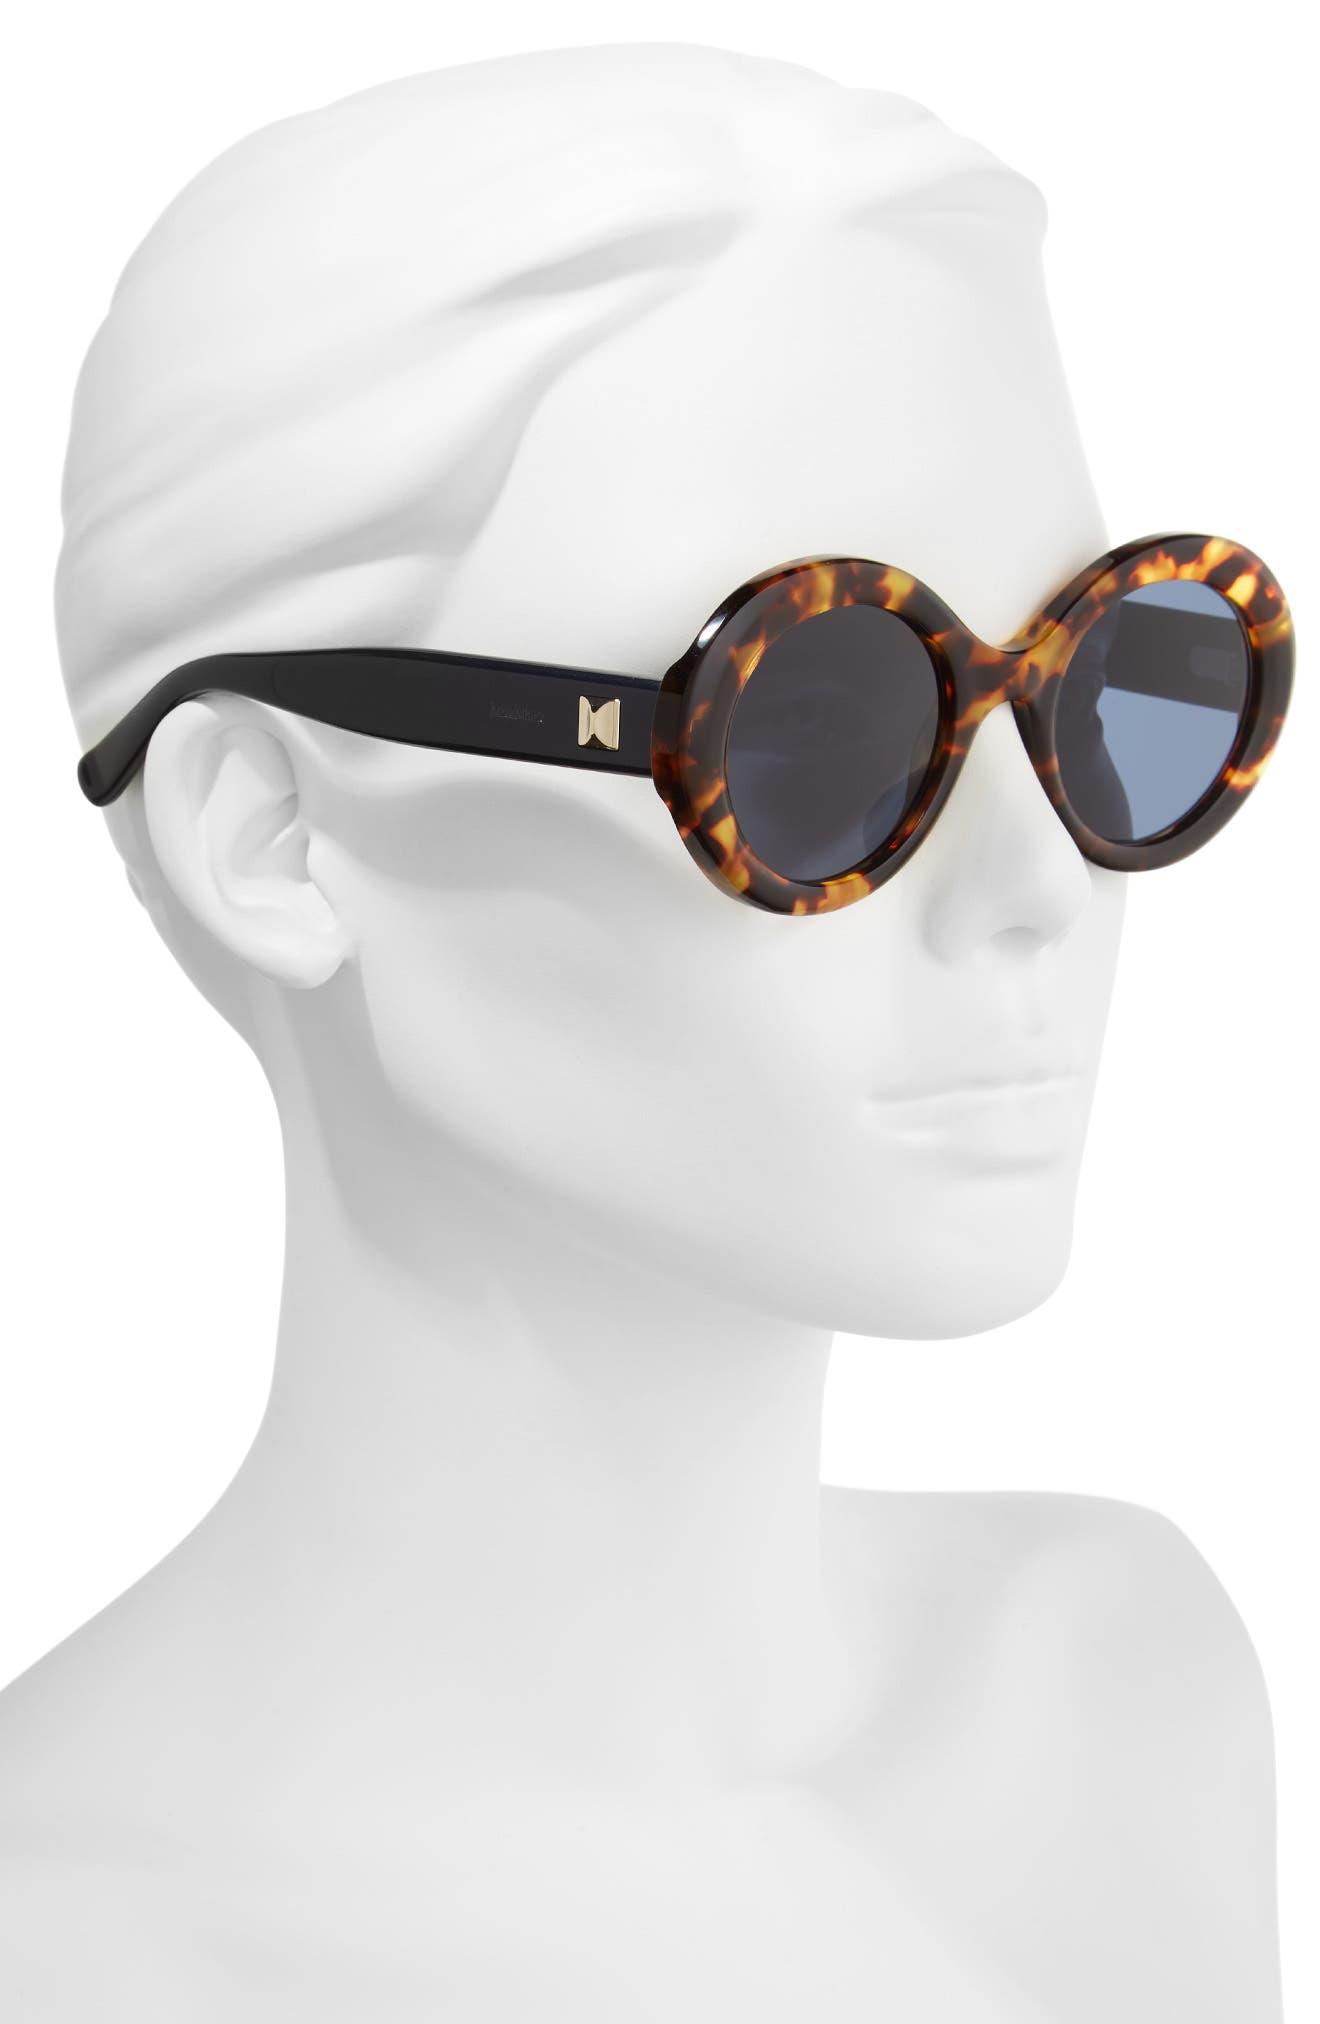 Prism VIII 51mm Oval Sunglasses,                             Alternate thumbnail 2, color,                             HAVANA BLUE